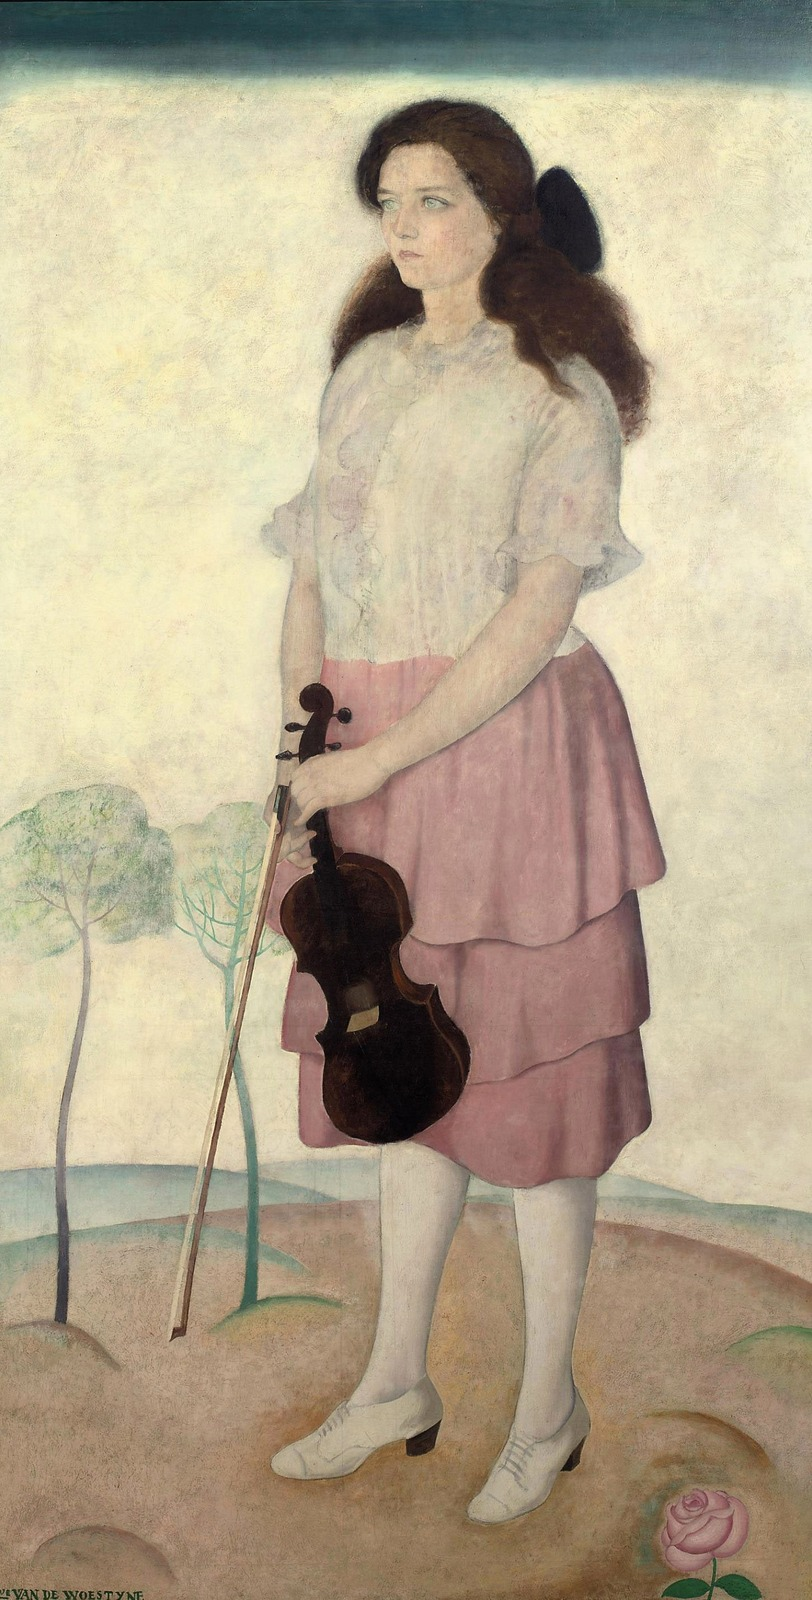 1920_Адриенна со скрипкой (Adrienne with a violin)_210 х 110_х.,м._Частное собрание.jpg